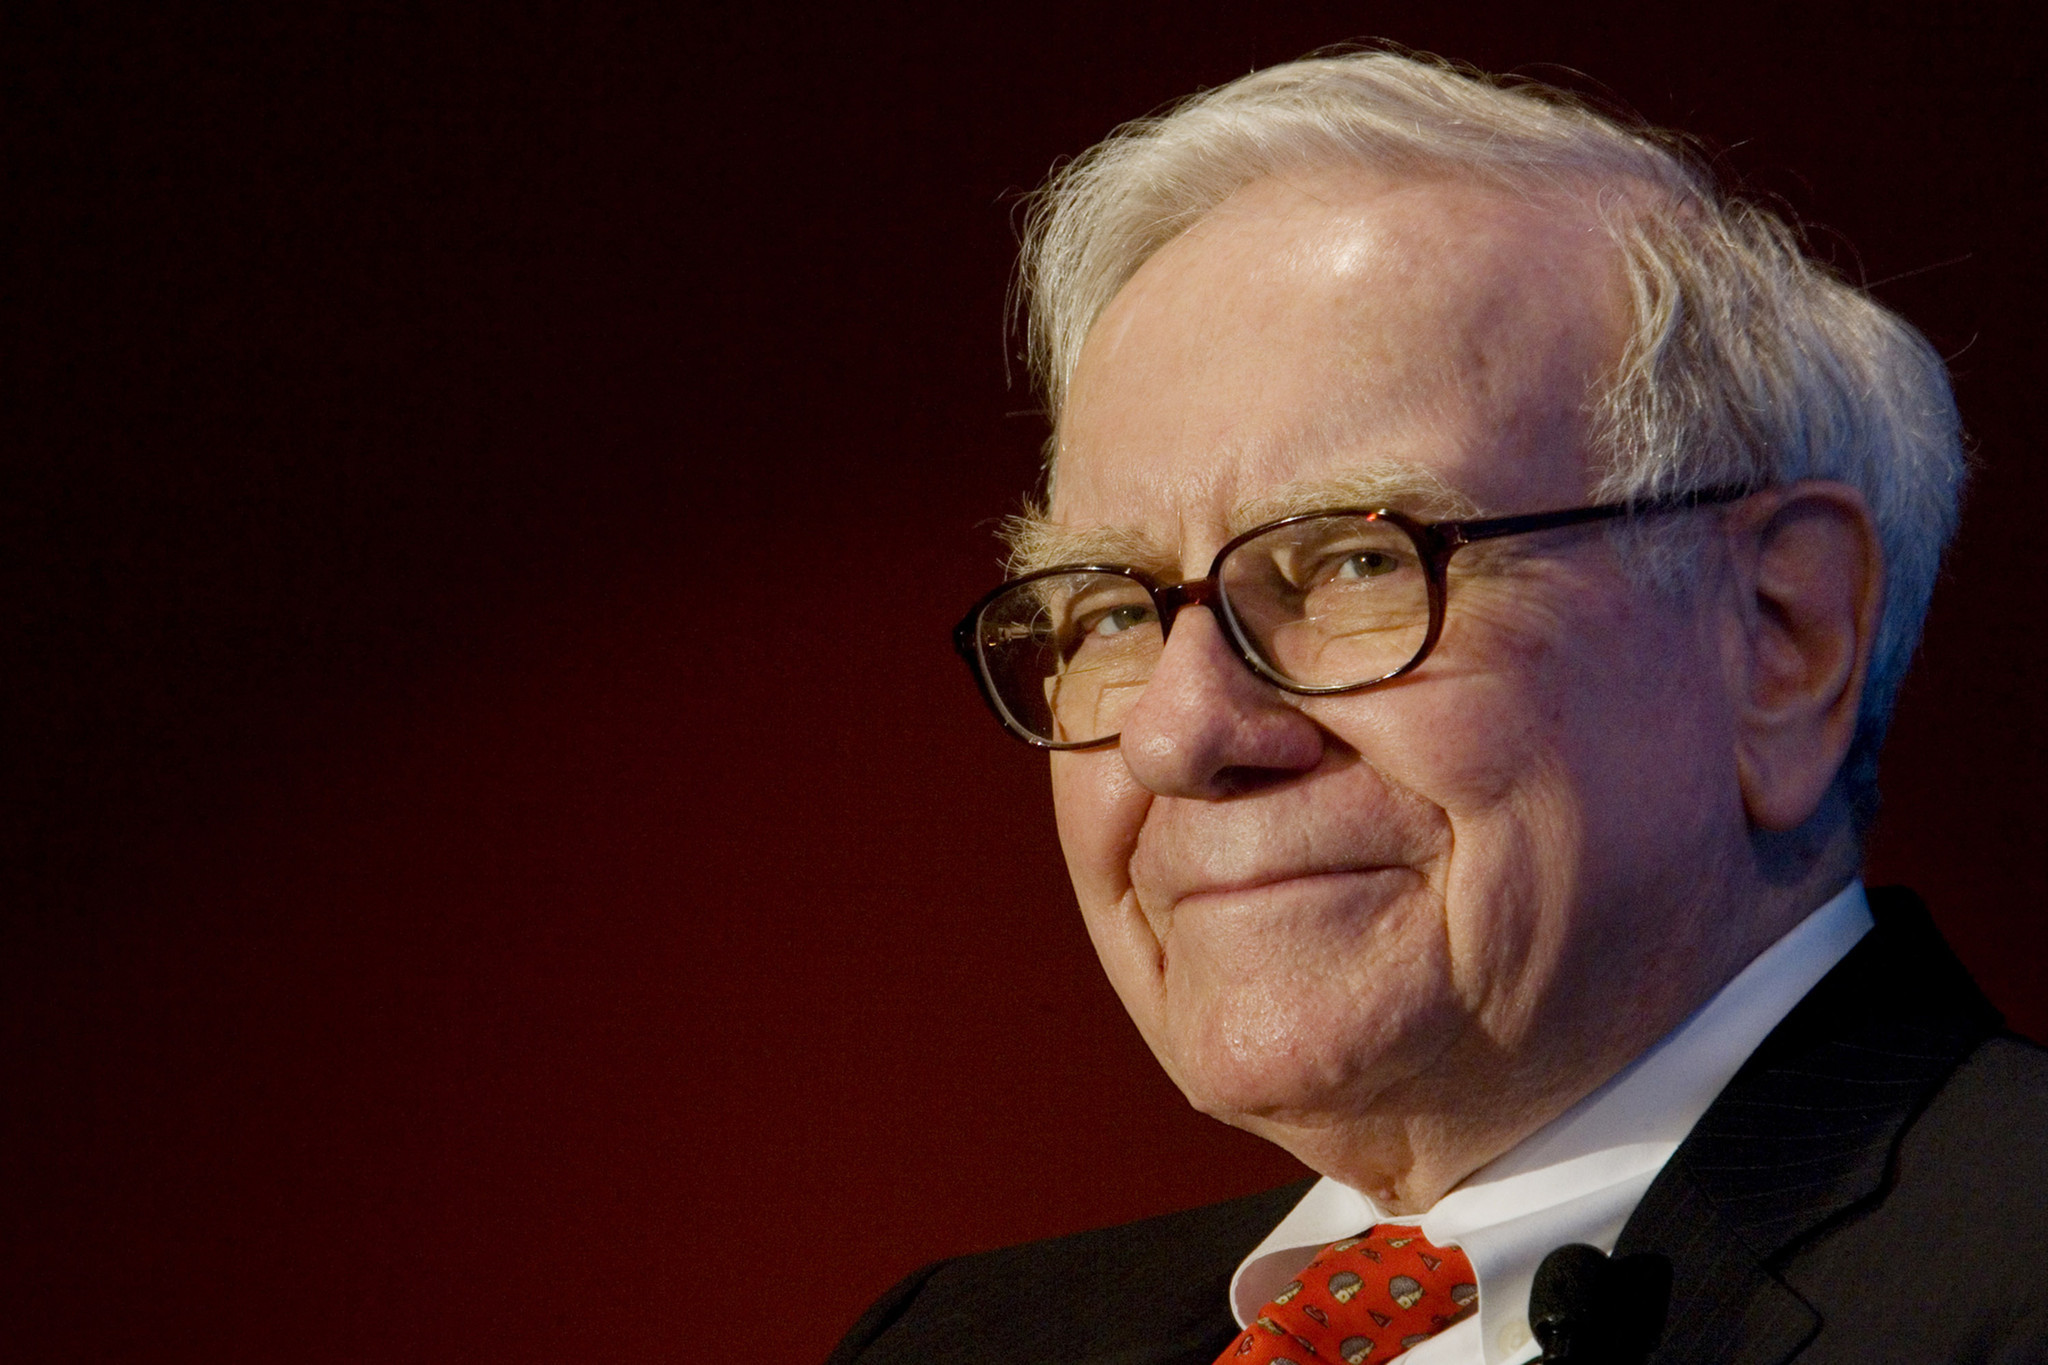 Warren Buffett Articles, Photos, and Videos - Los Angeles Times